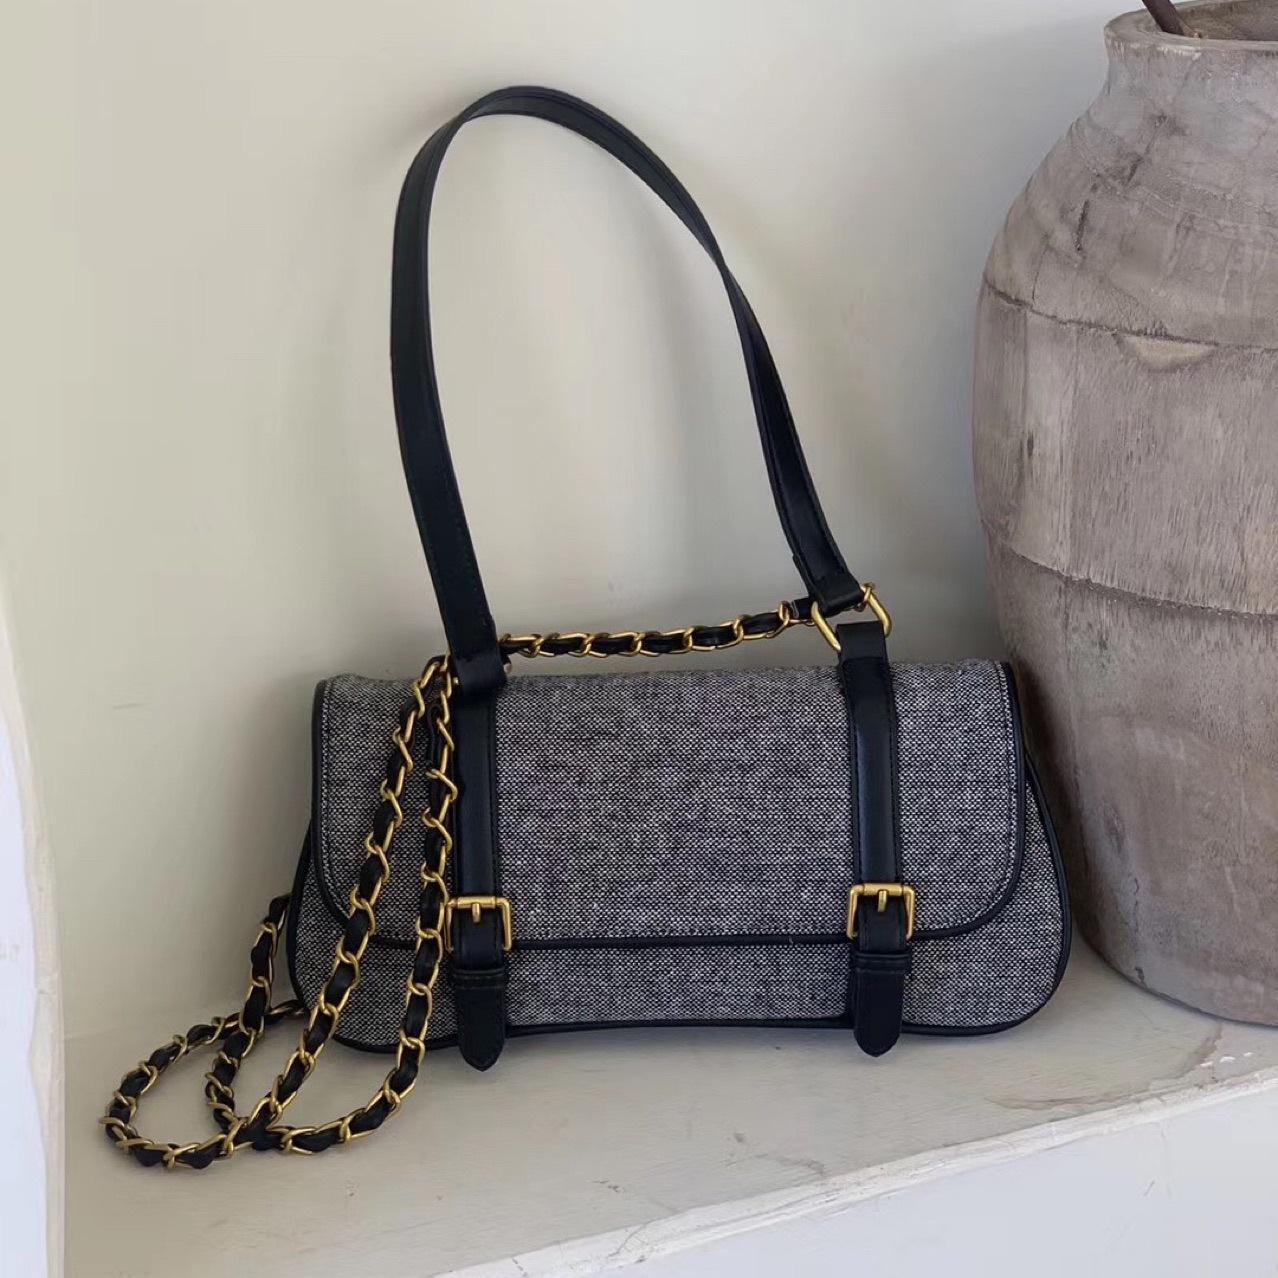 HBP Neueste Mode Baguette Taschen Frauen Geldbörse Umhängetasche Crossbody Bag Freies Verschiffen